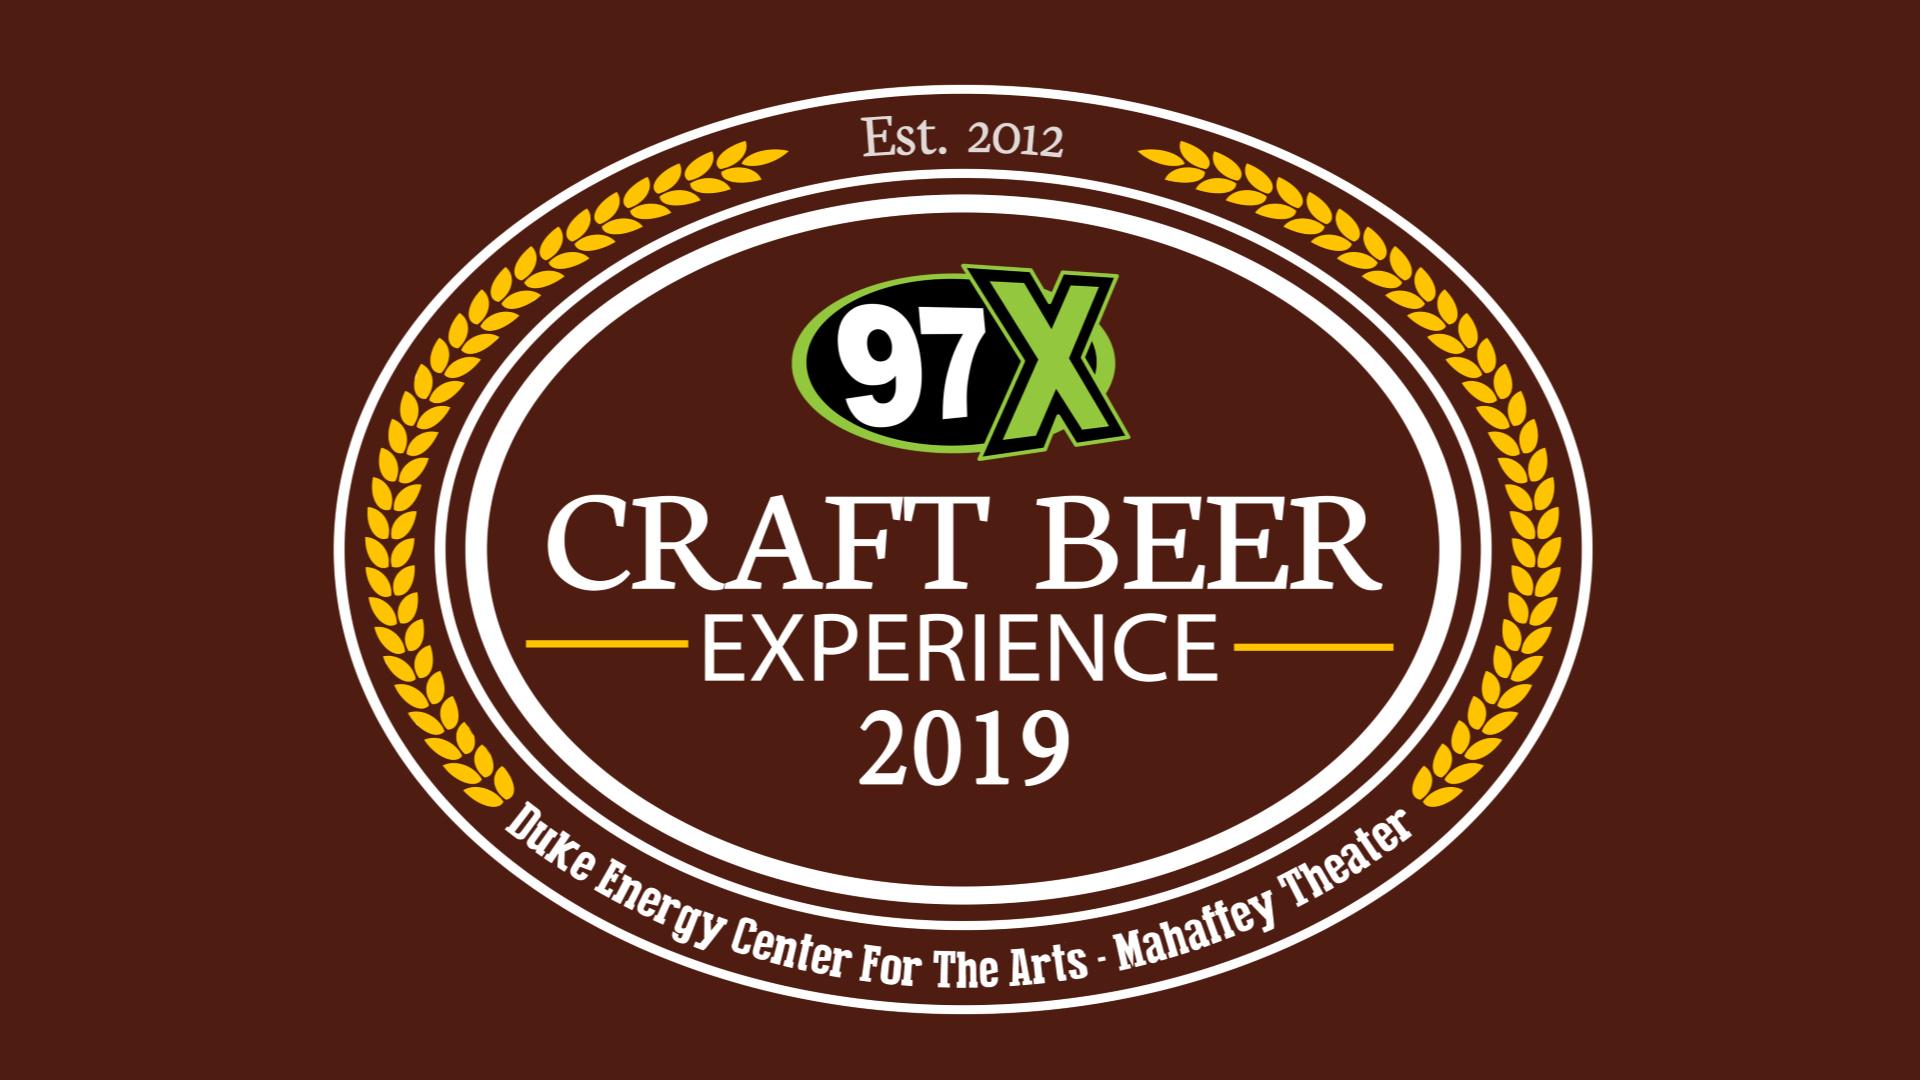 97X Craft Beer Experience Flyer